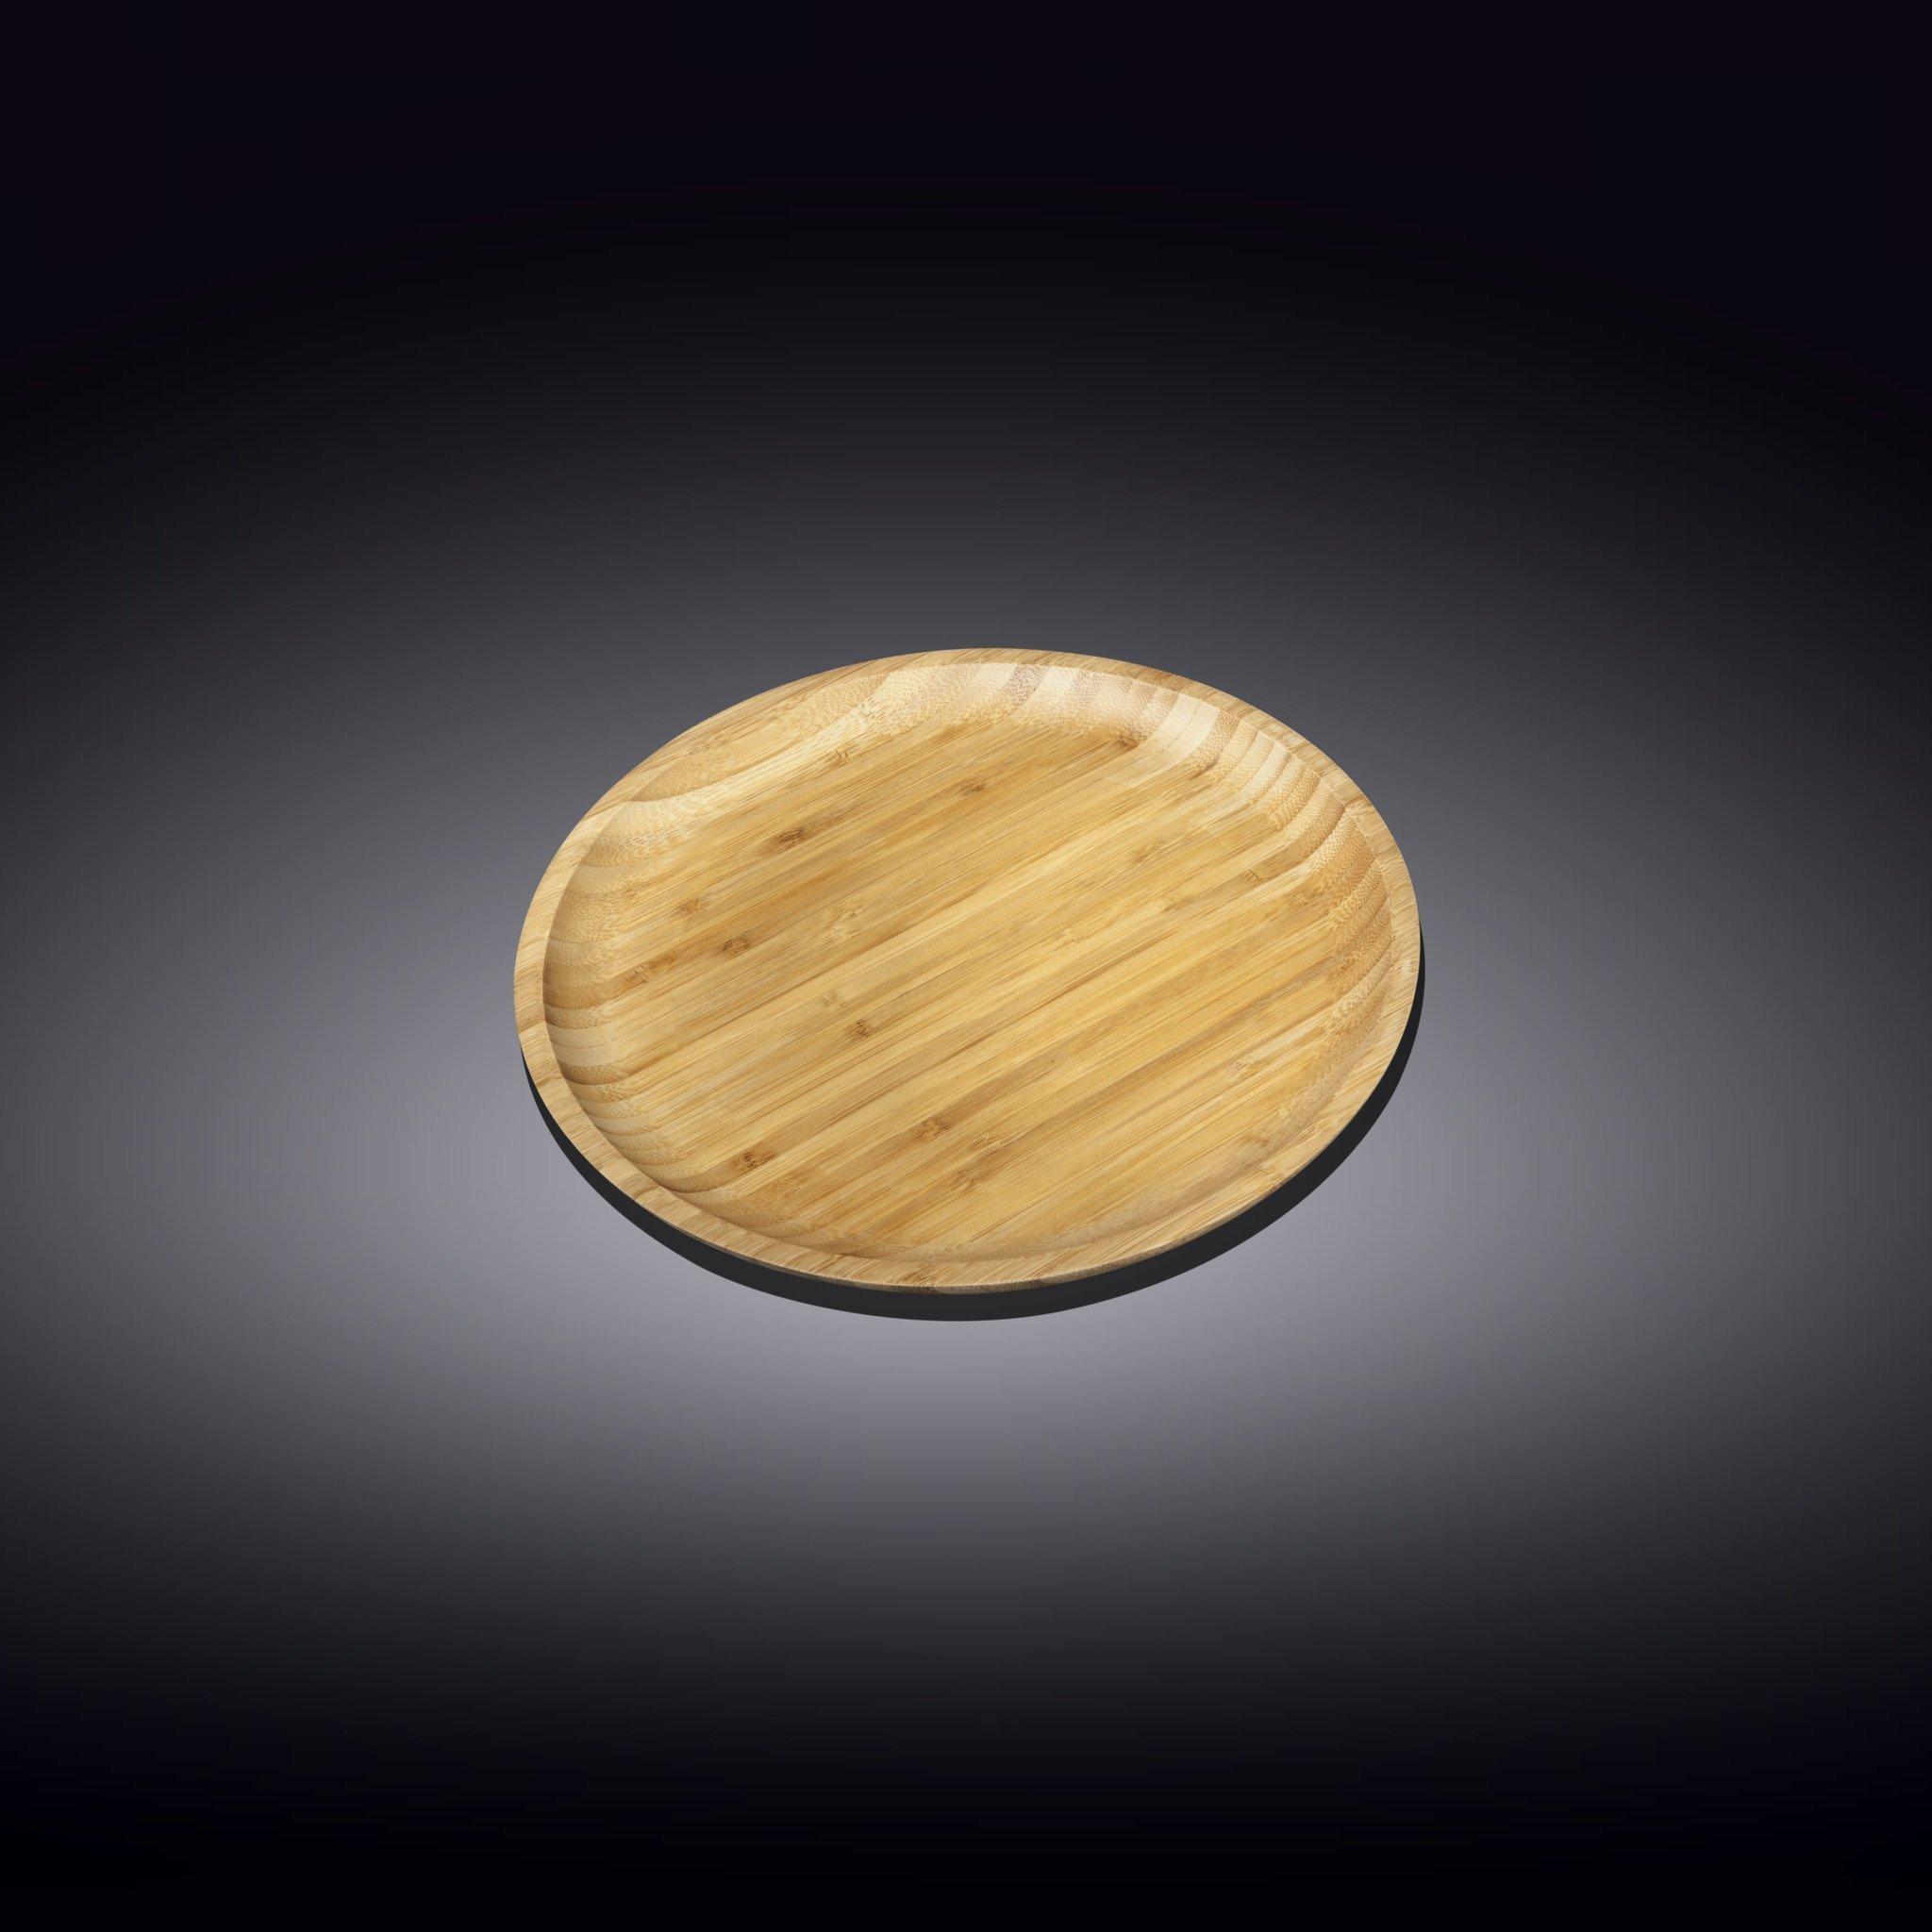 Тарелка бамбуковая Wilmax сервировочная круглая 10 см